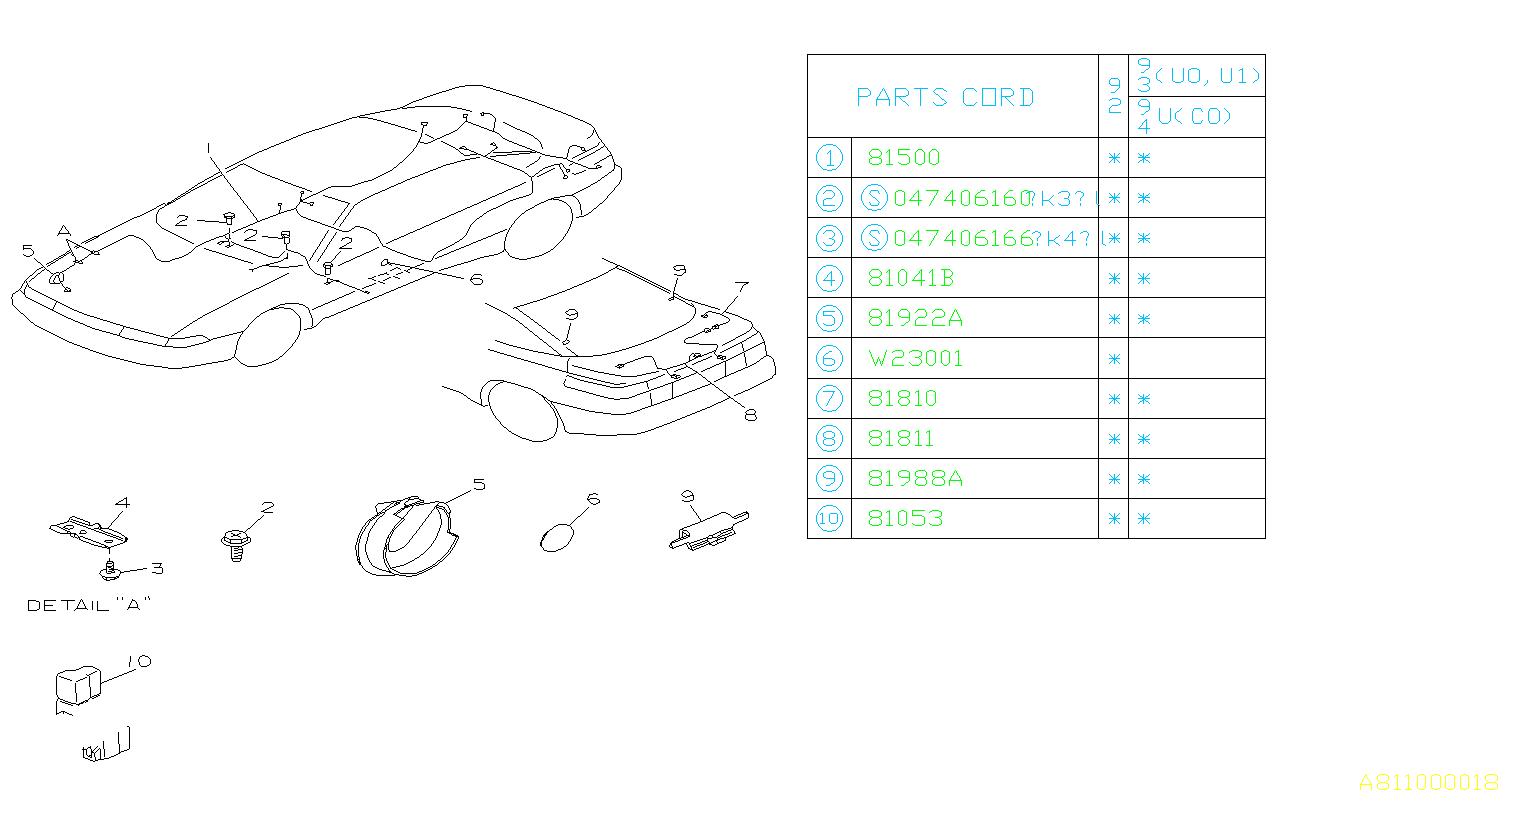 Subaru Svx Hole Plug Right Rh Side Harness Wiring